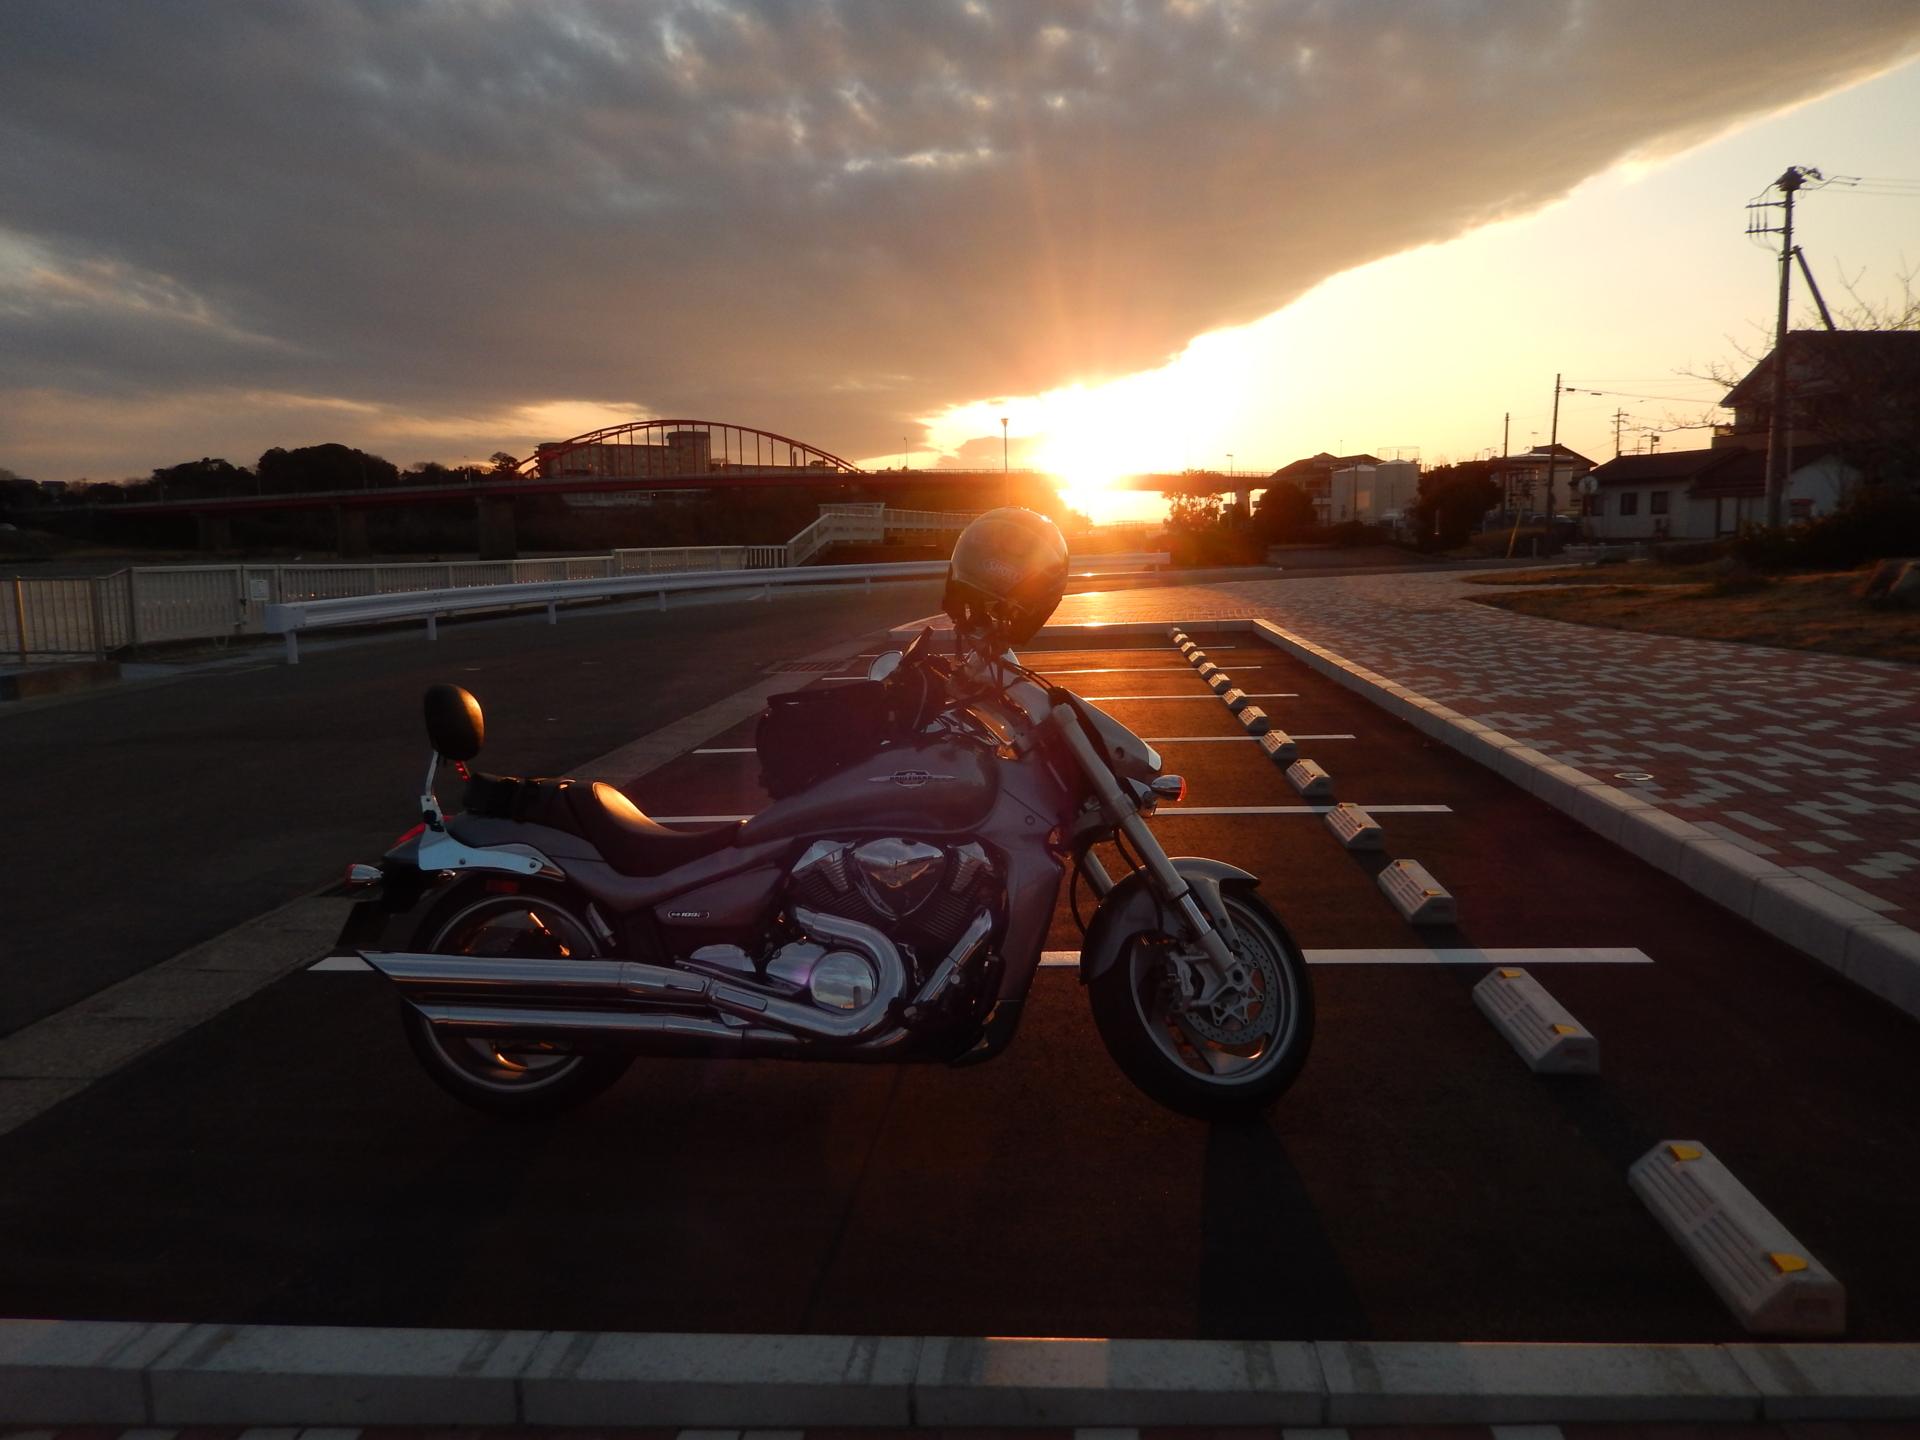 f:id:ToshUeno:20150227171148j:plain